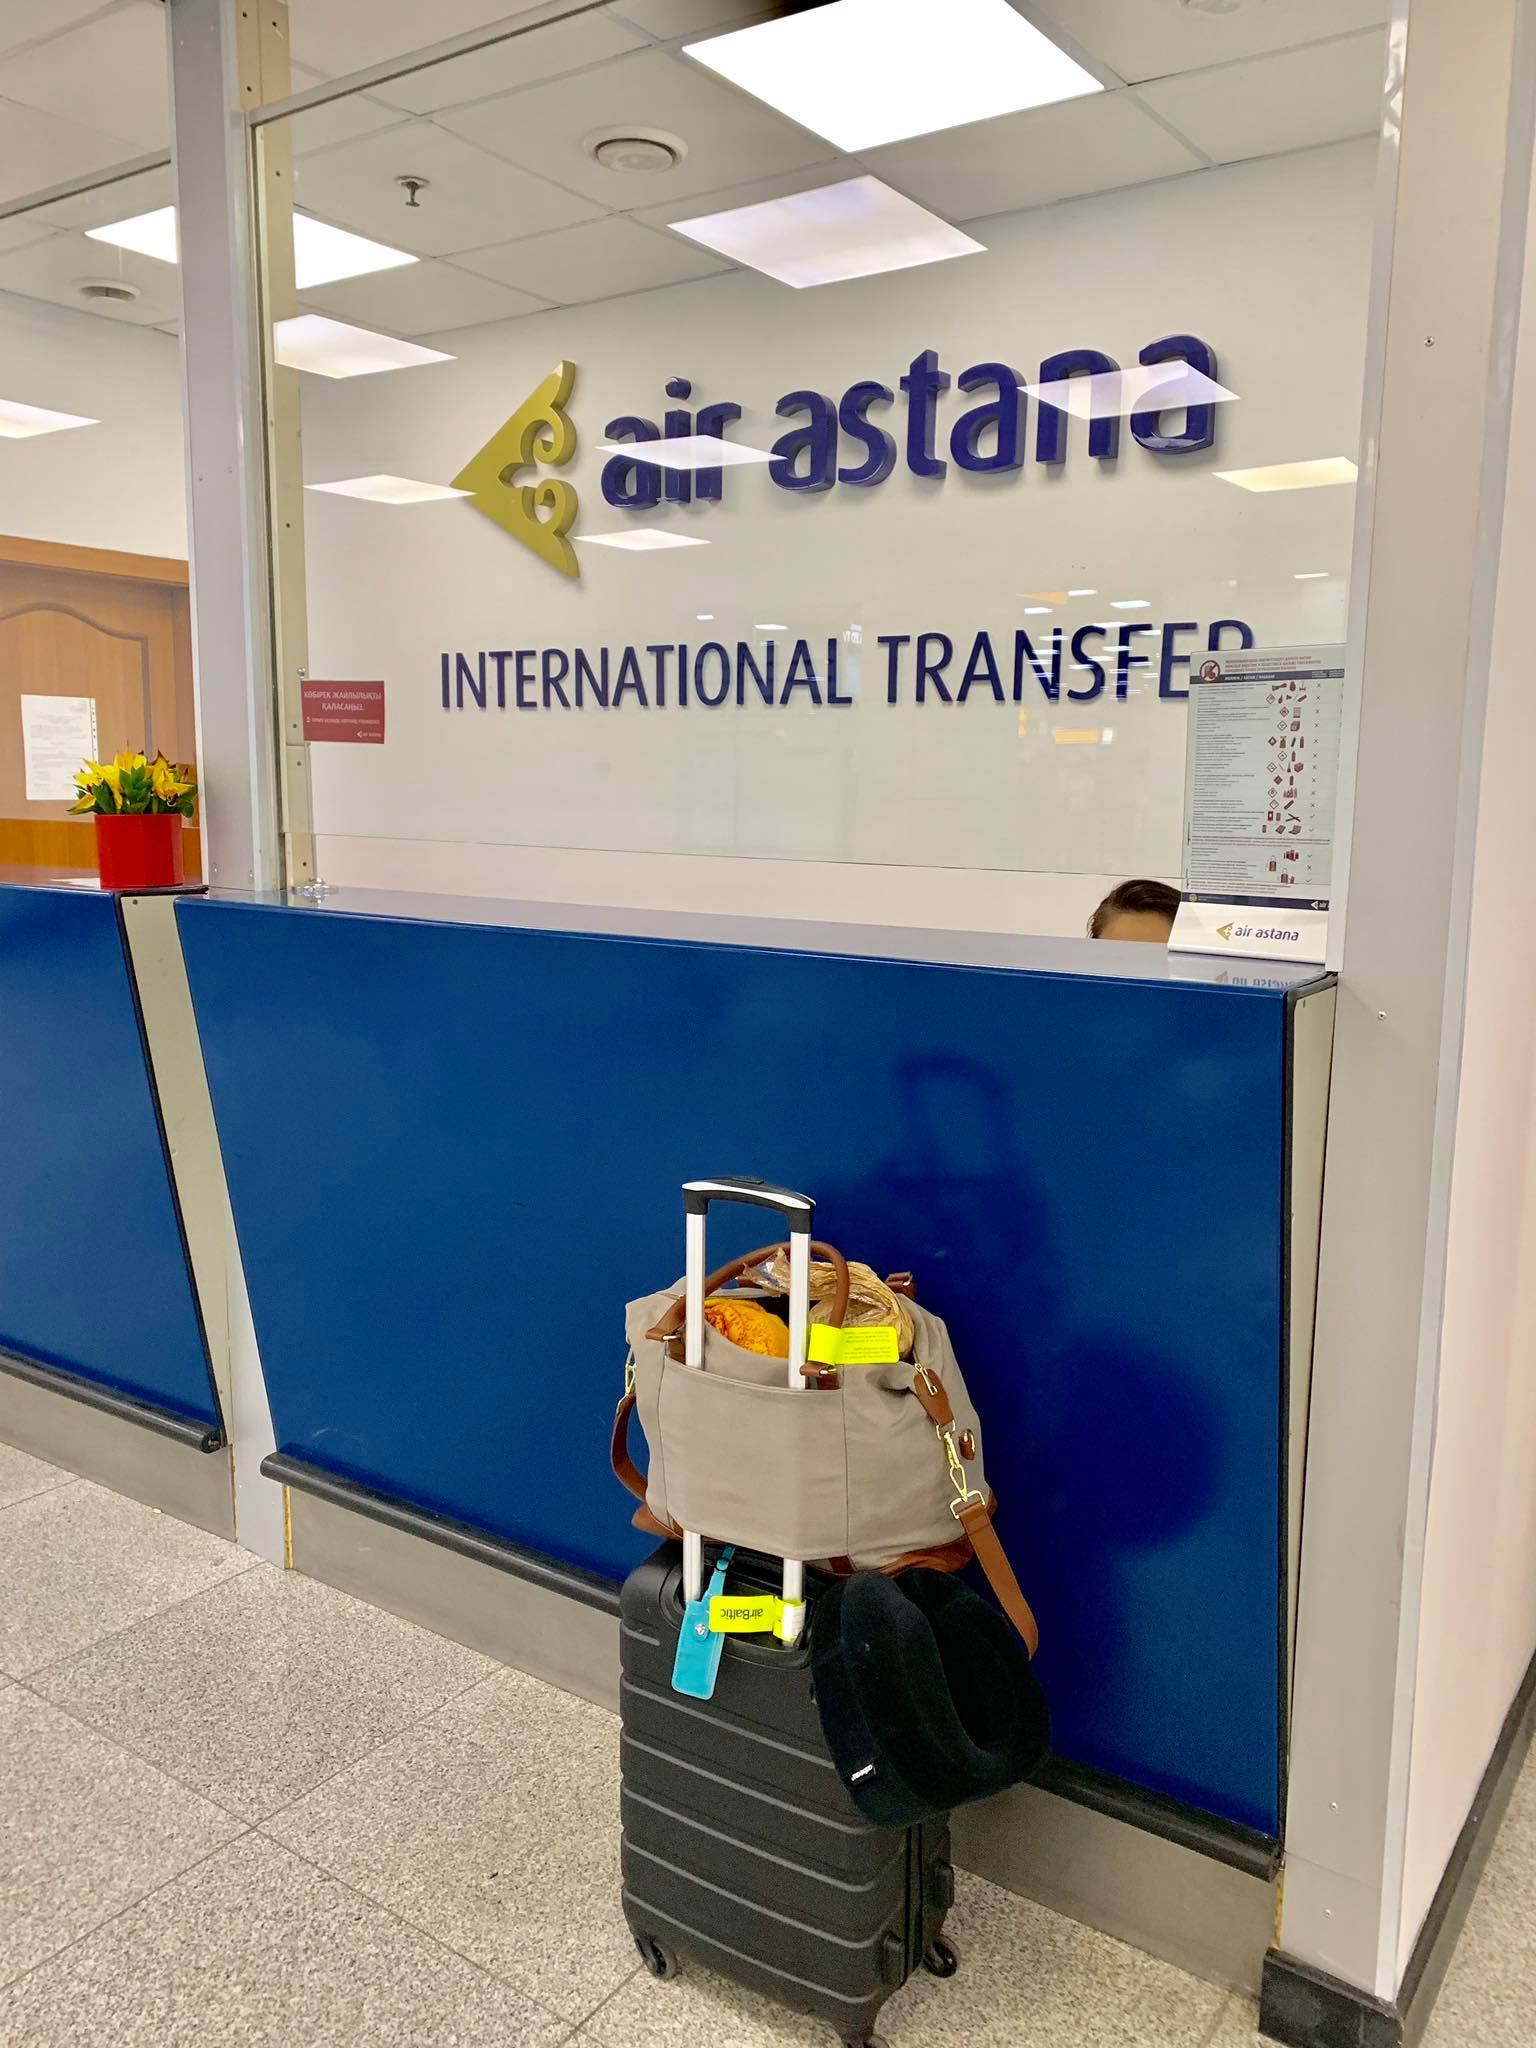 Kach Solo Travels in 2019 I just arrived in Dushanbe, Tajikistan7.jpg